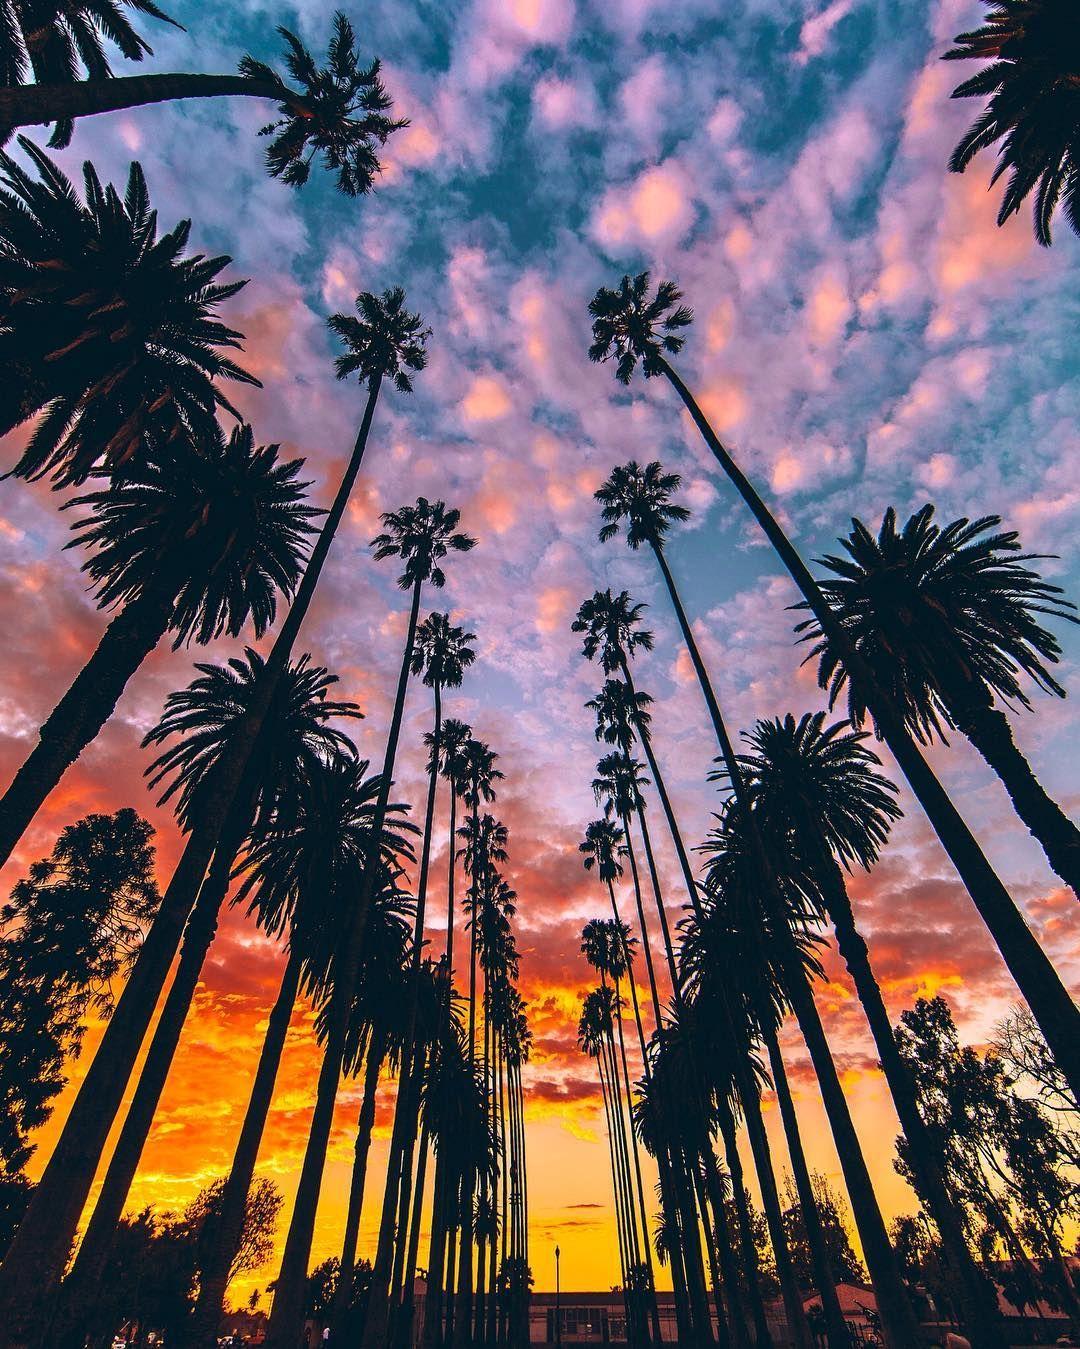 Dating στο Σαν Ντιέγκο της Καλιφόρνιας